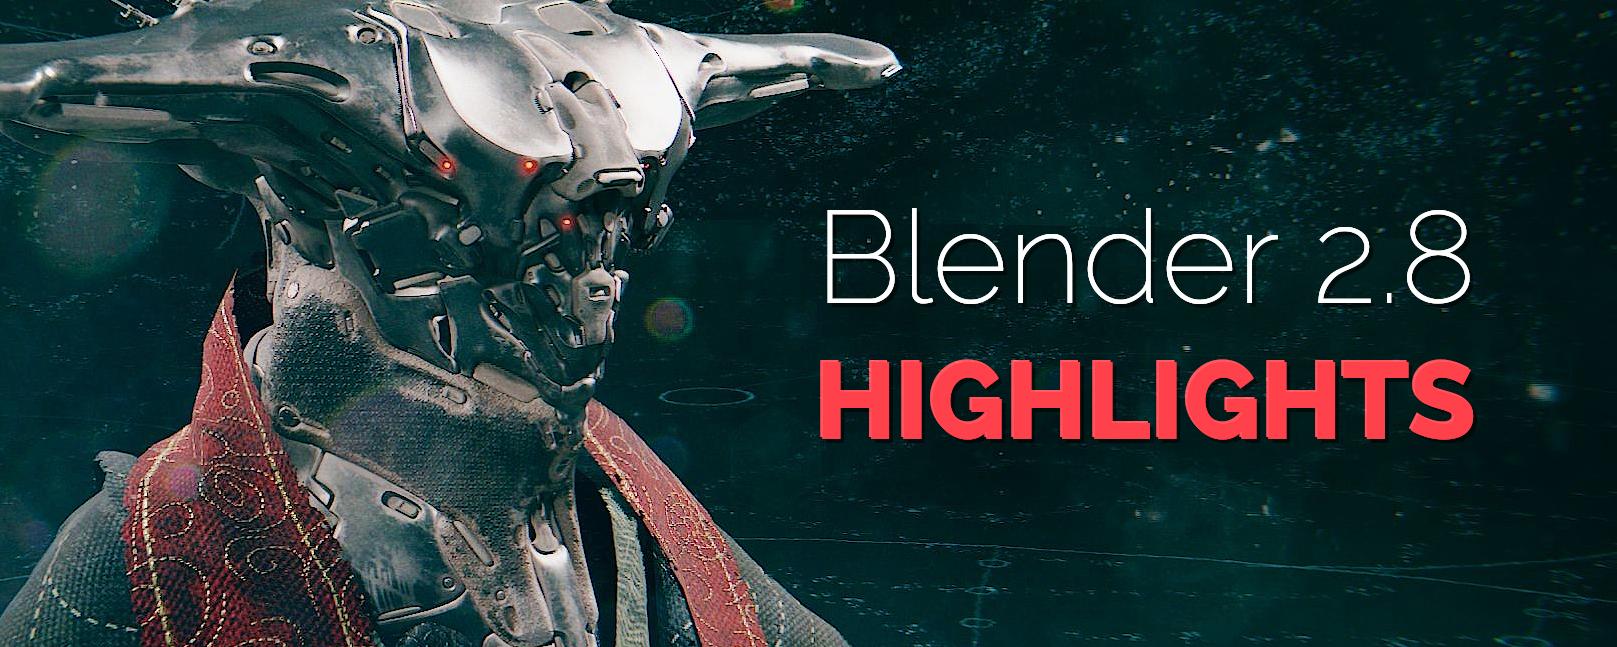 Blender 2.8 Highlights